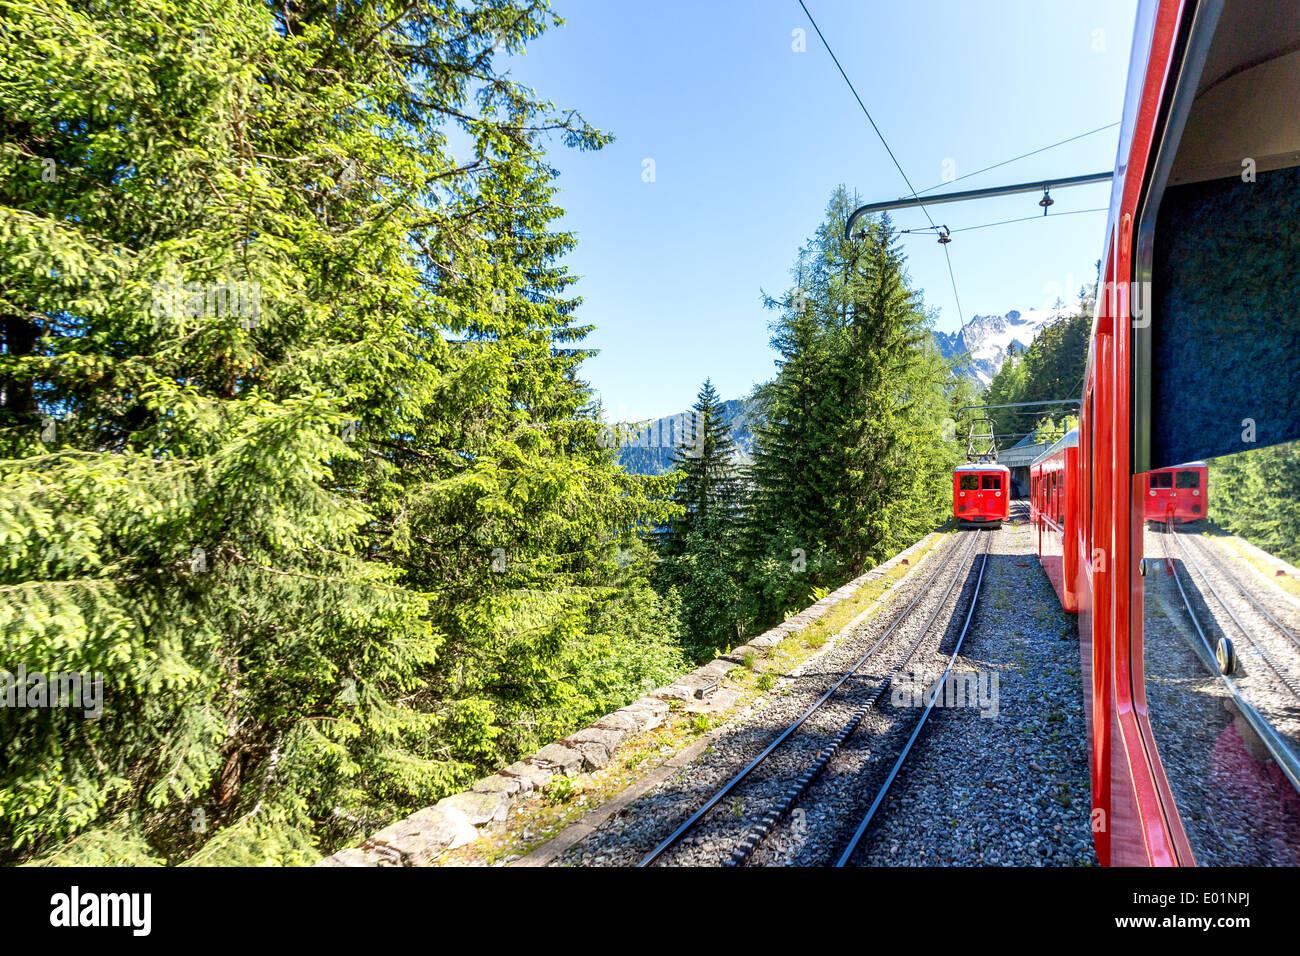 Meeting cog wheel trains on a railway between Montevers and Chamonix (heading towards Mer de Glace glacier), France, EU - Stock Image